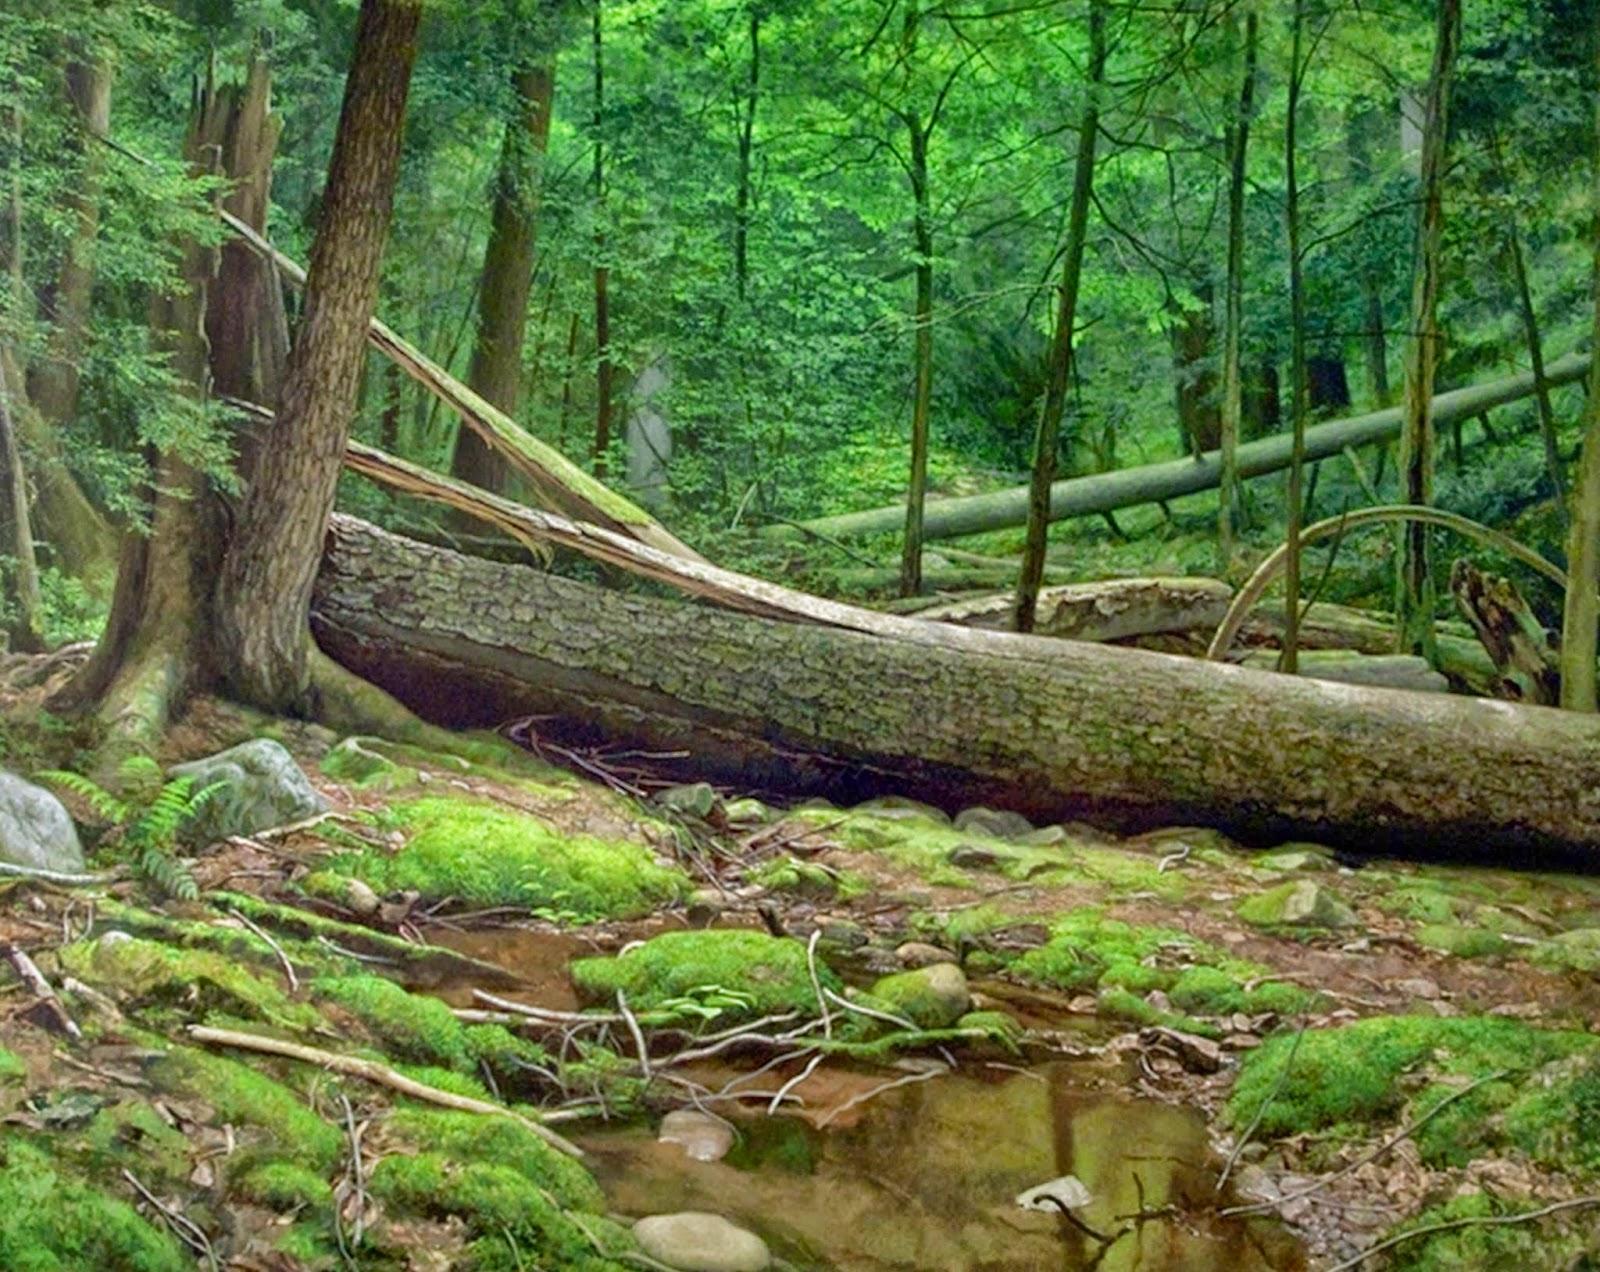 cuadros-al-oleo-de-paisajes-selvaticos-naturales